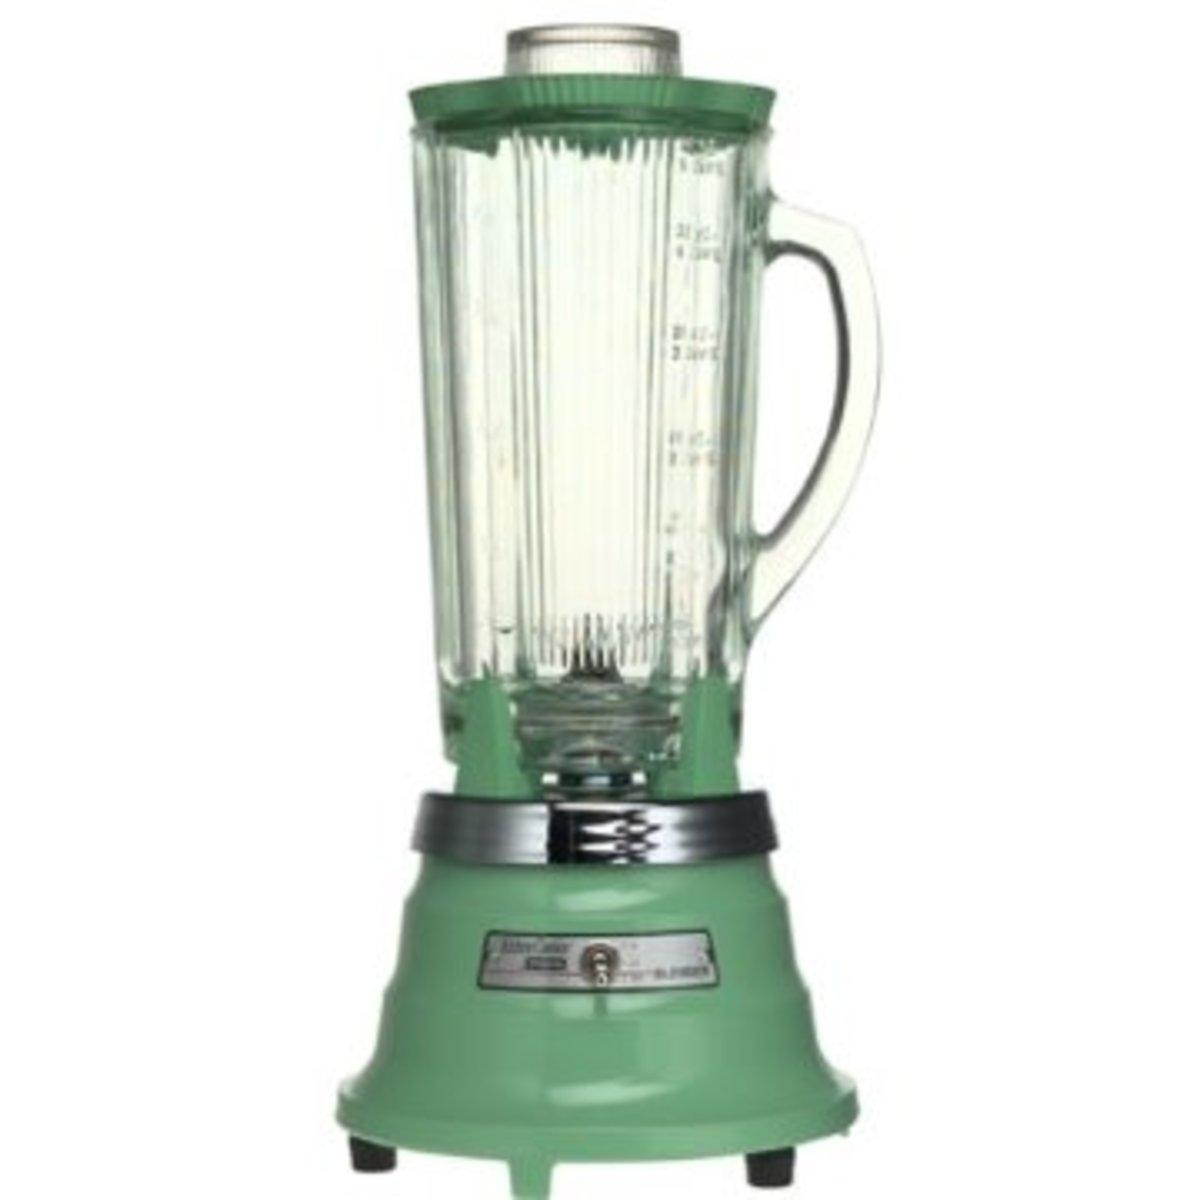 Waring modern blender in retro green